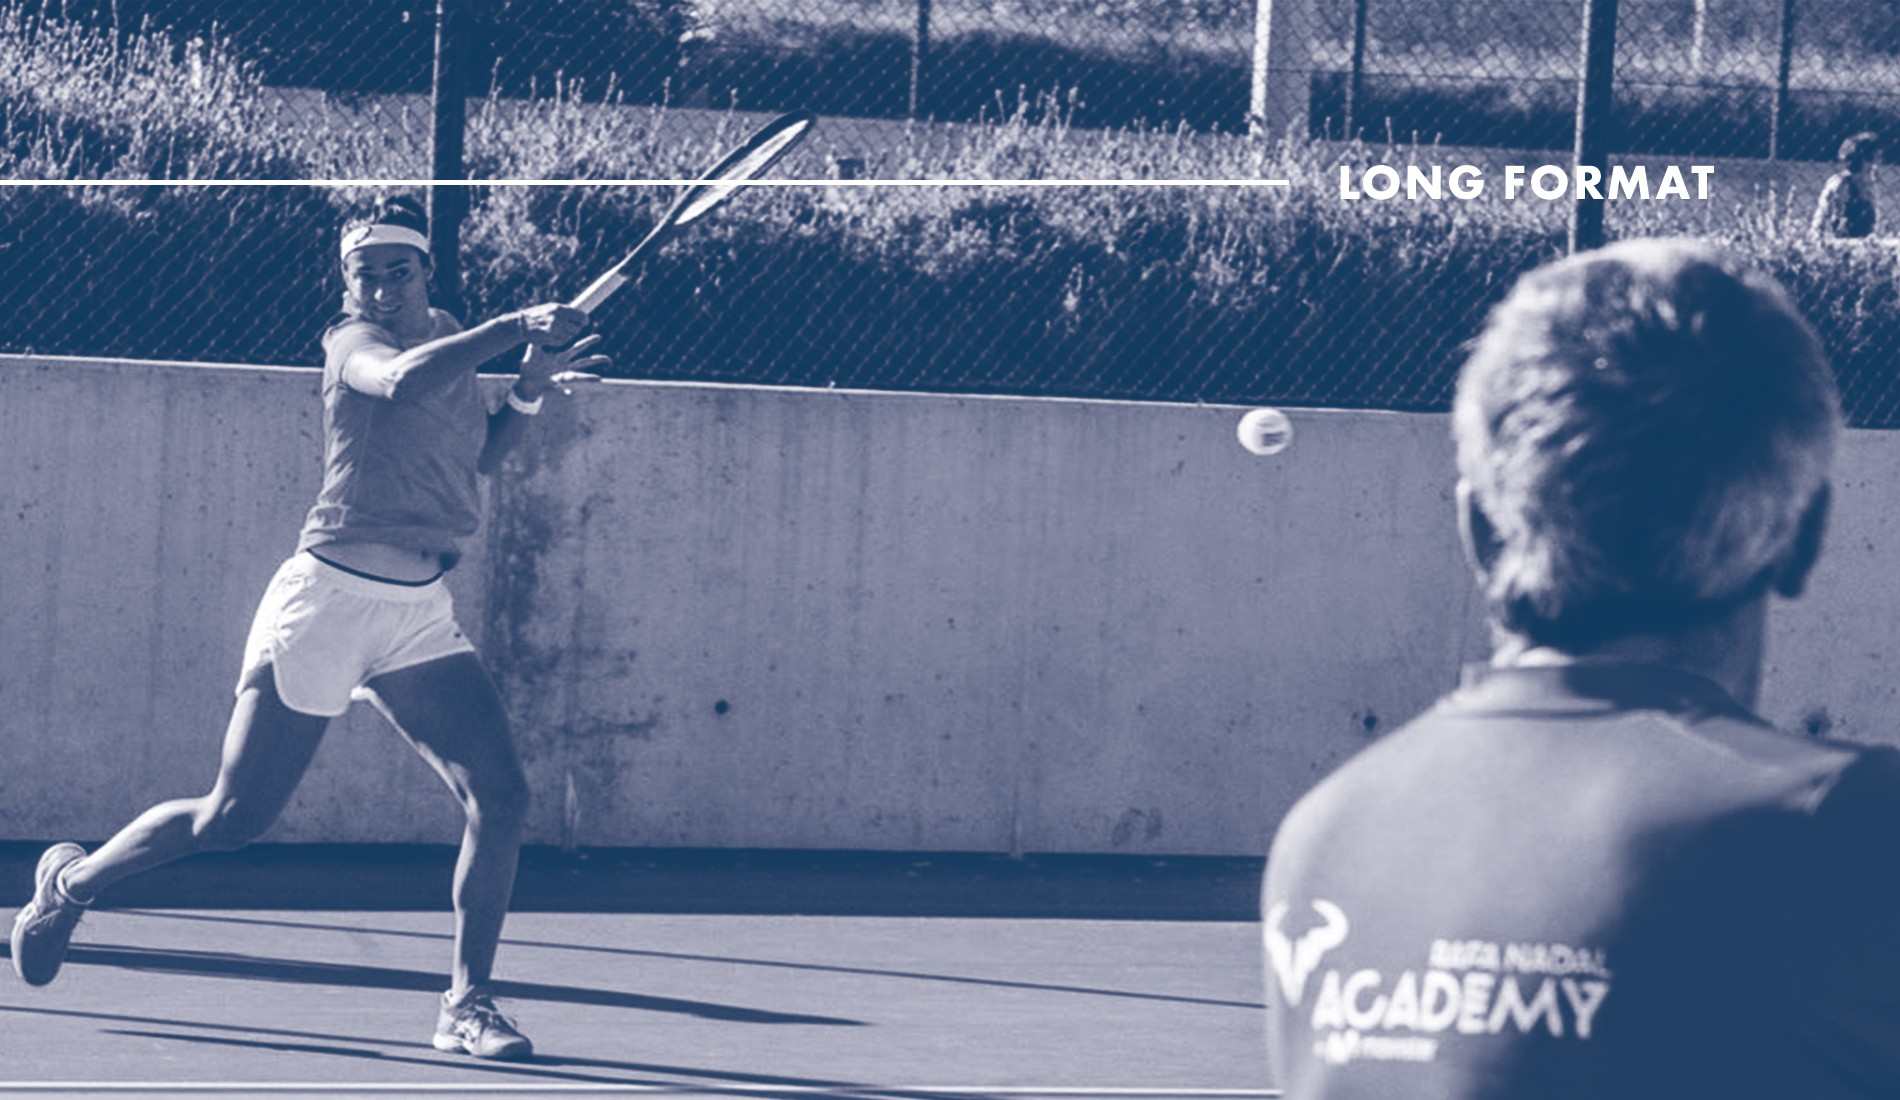 Caroline Garcia, Nadal Académie (Long Format Tennis Majors)